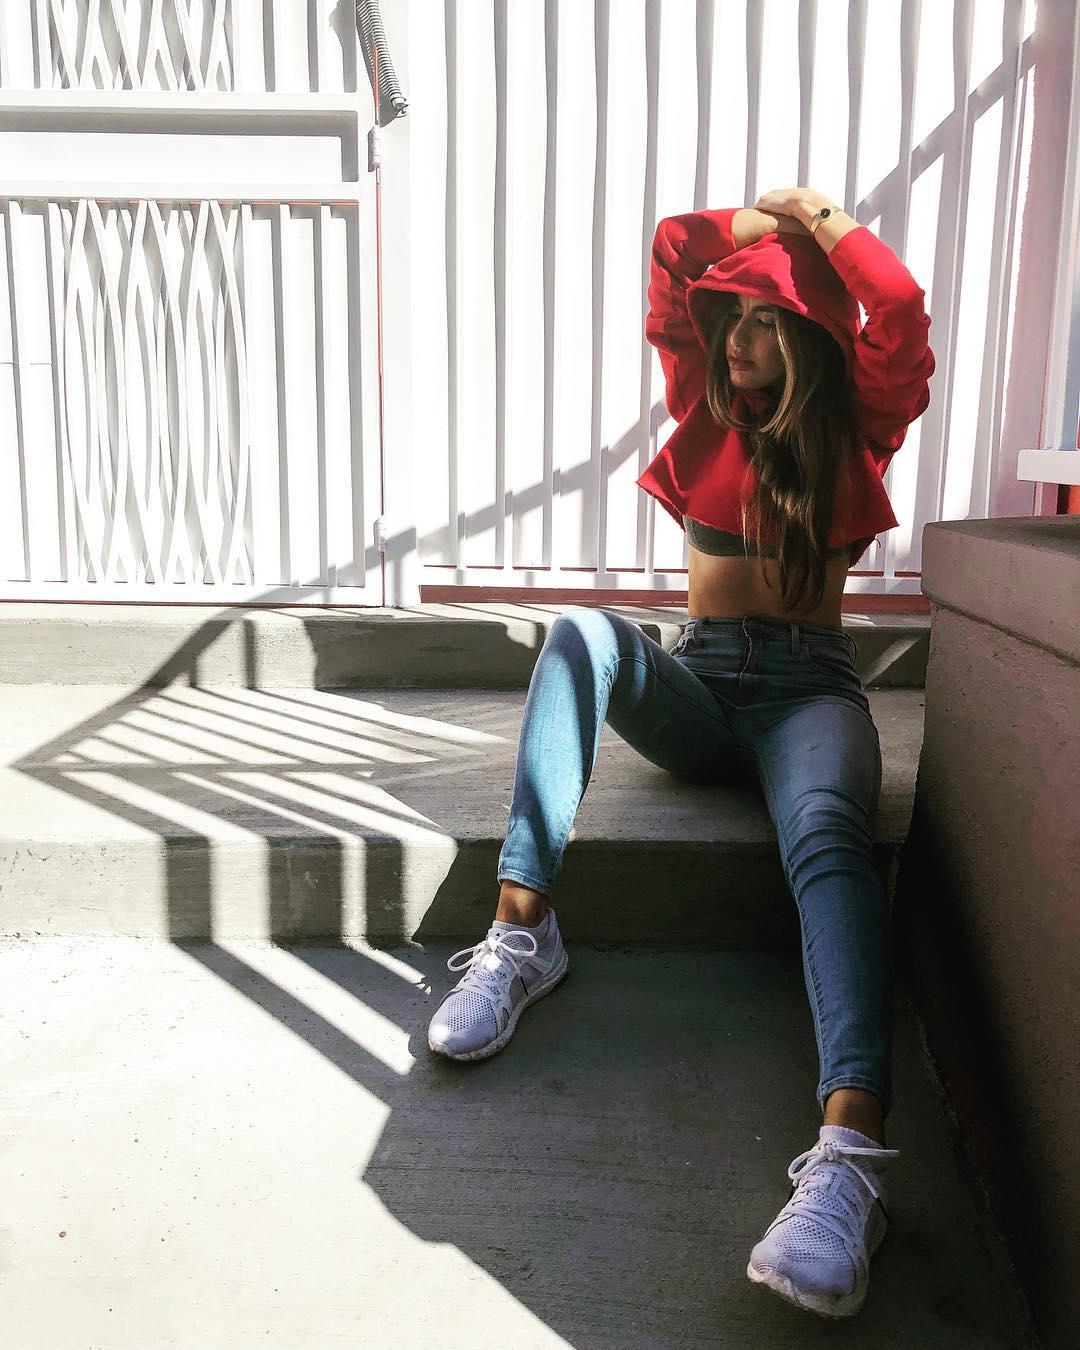 Natasha-Niknejad-Wallpapers-Insta-Fit-Bio-9